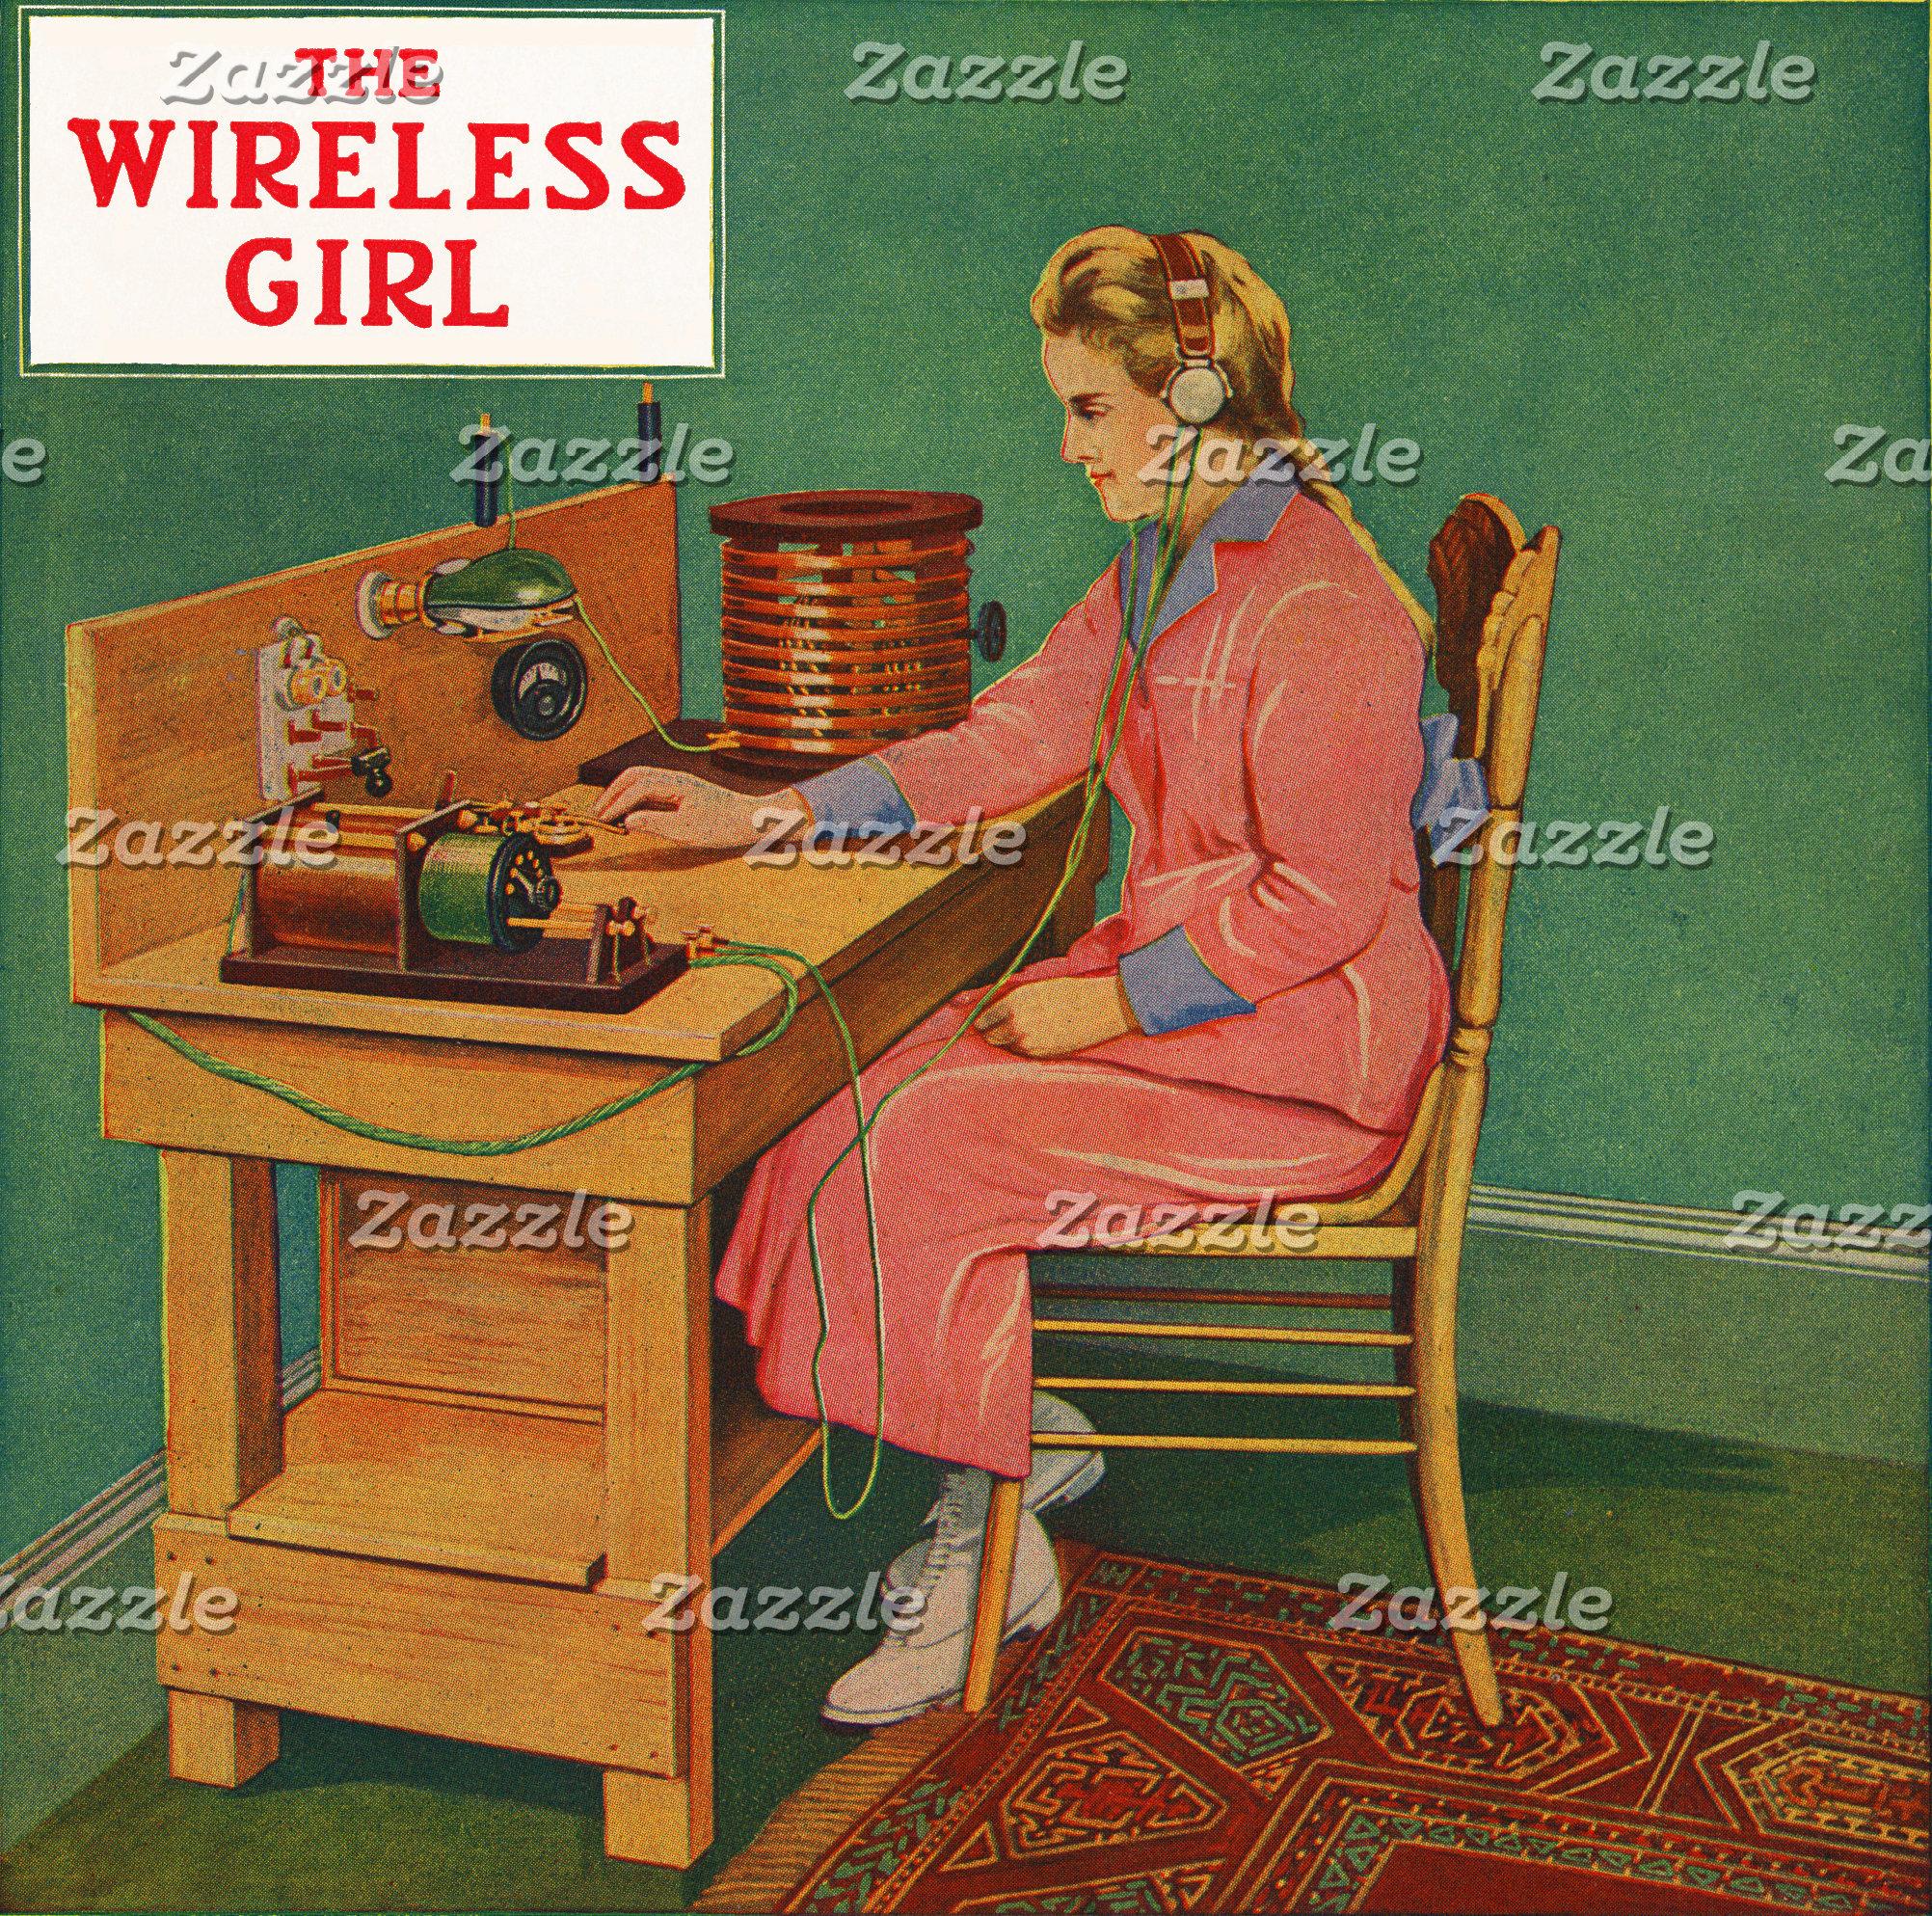 The Wireless Girl